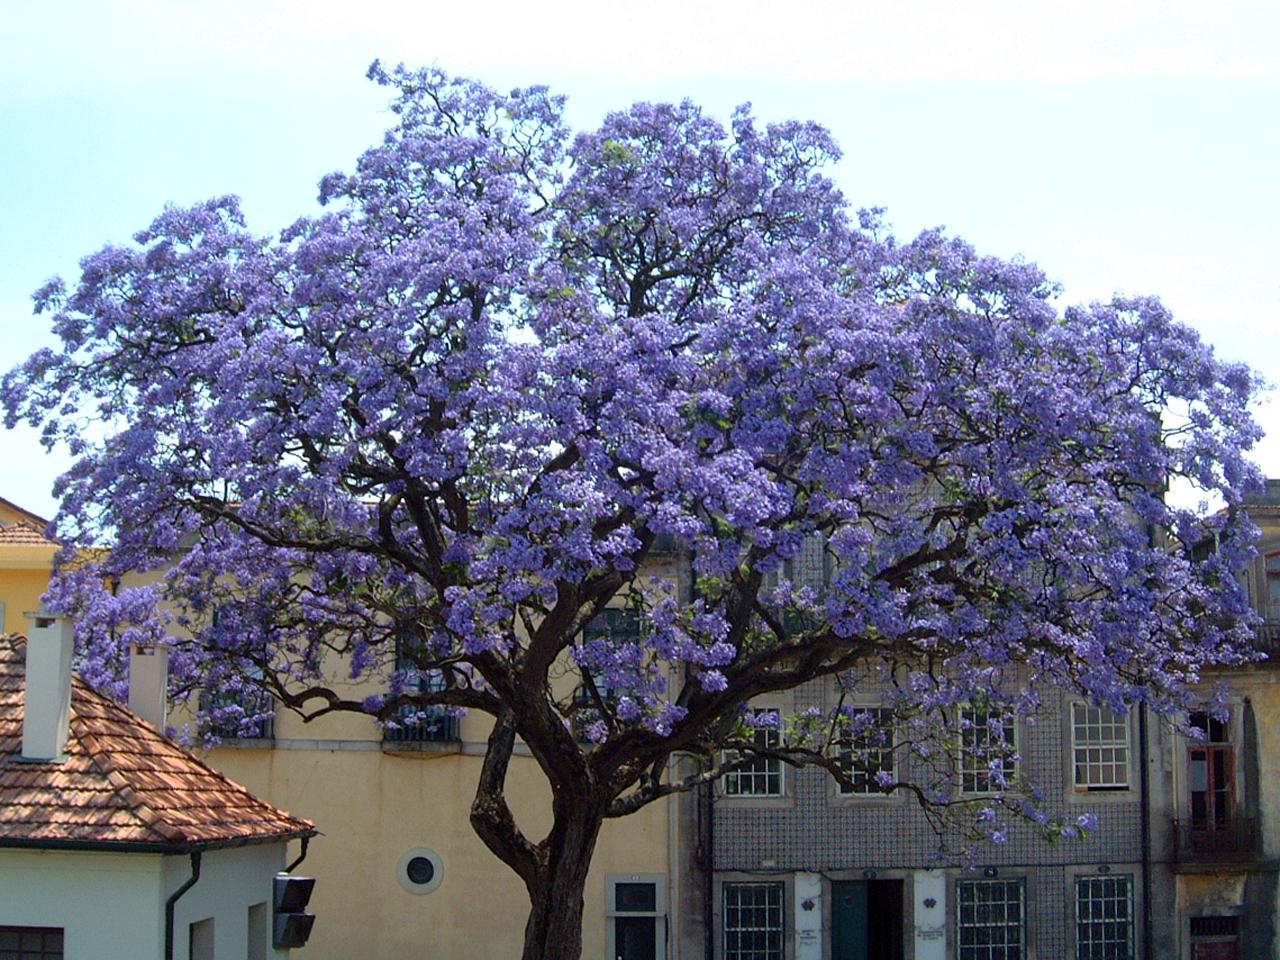 http://www.nargil.ir/plant/images/pic/522/Paulownia_tomentosa1.jpg